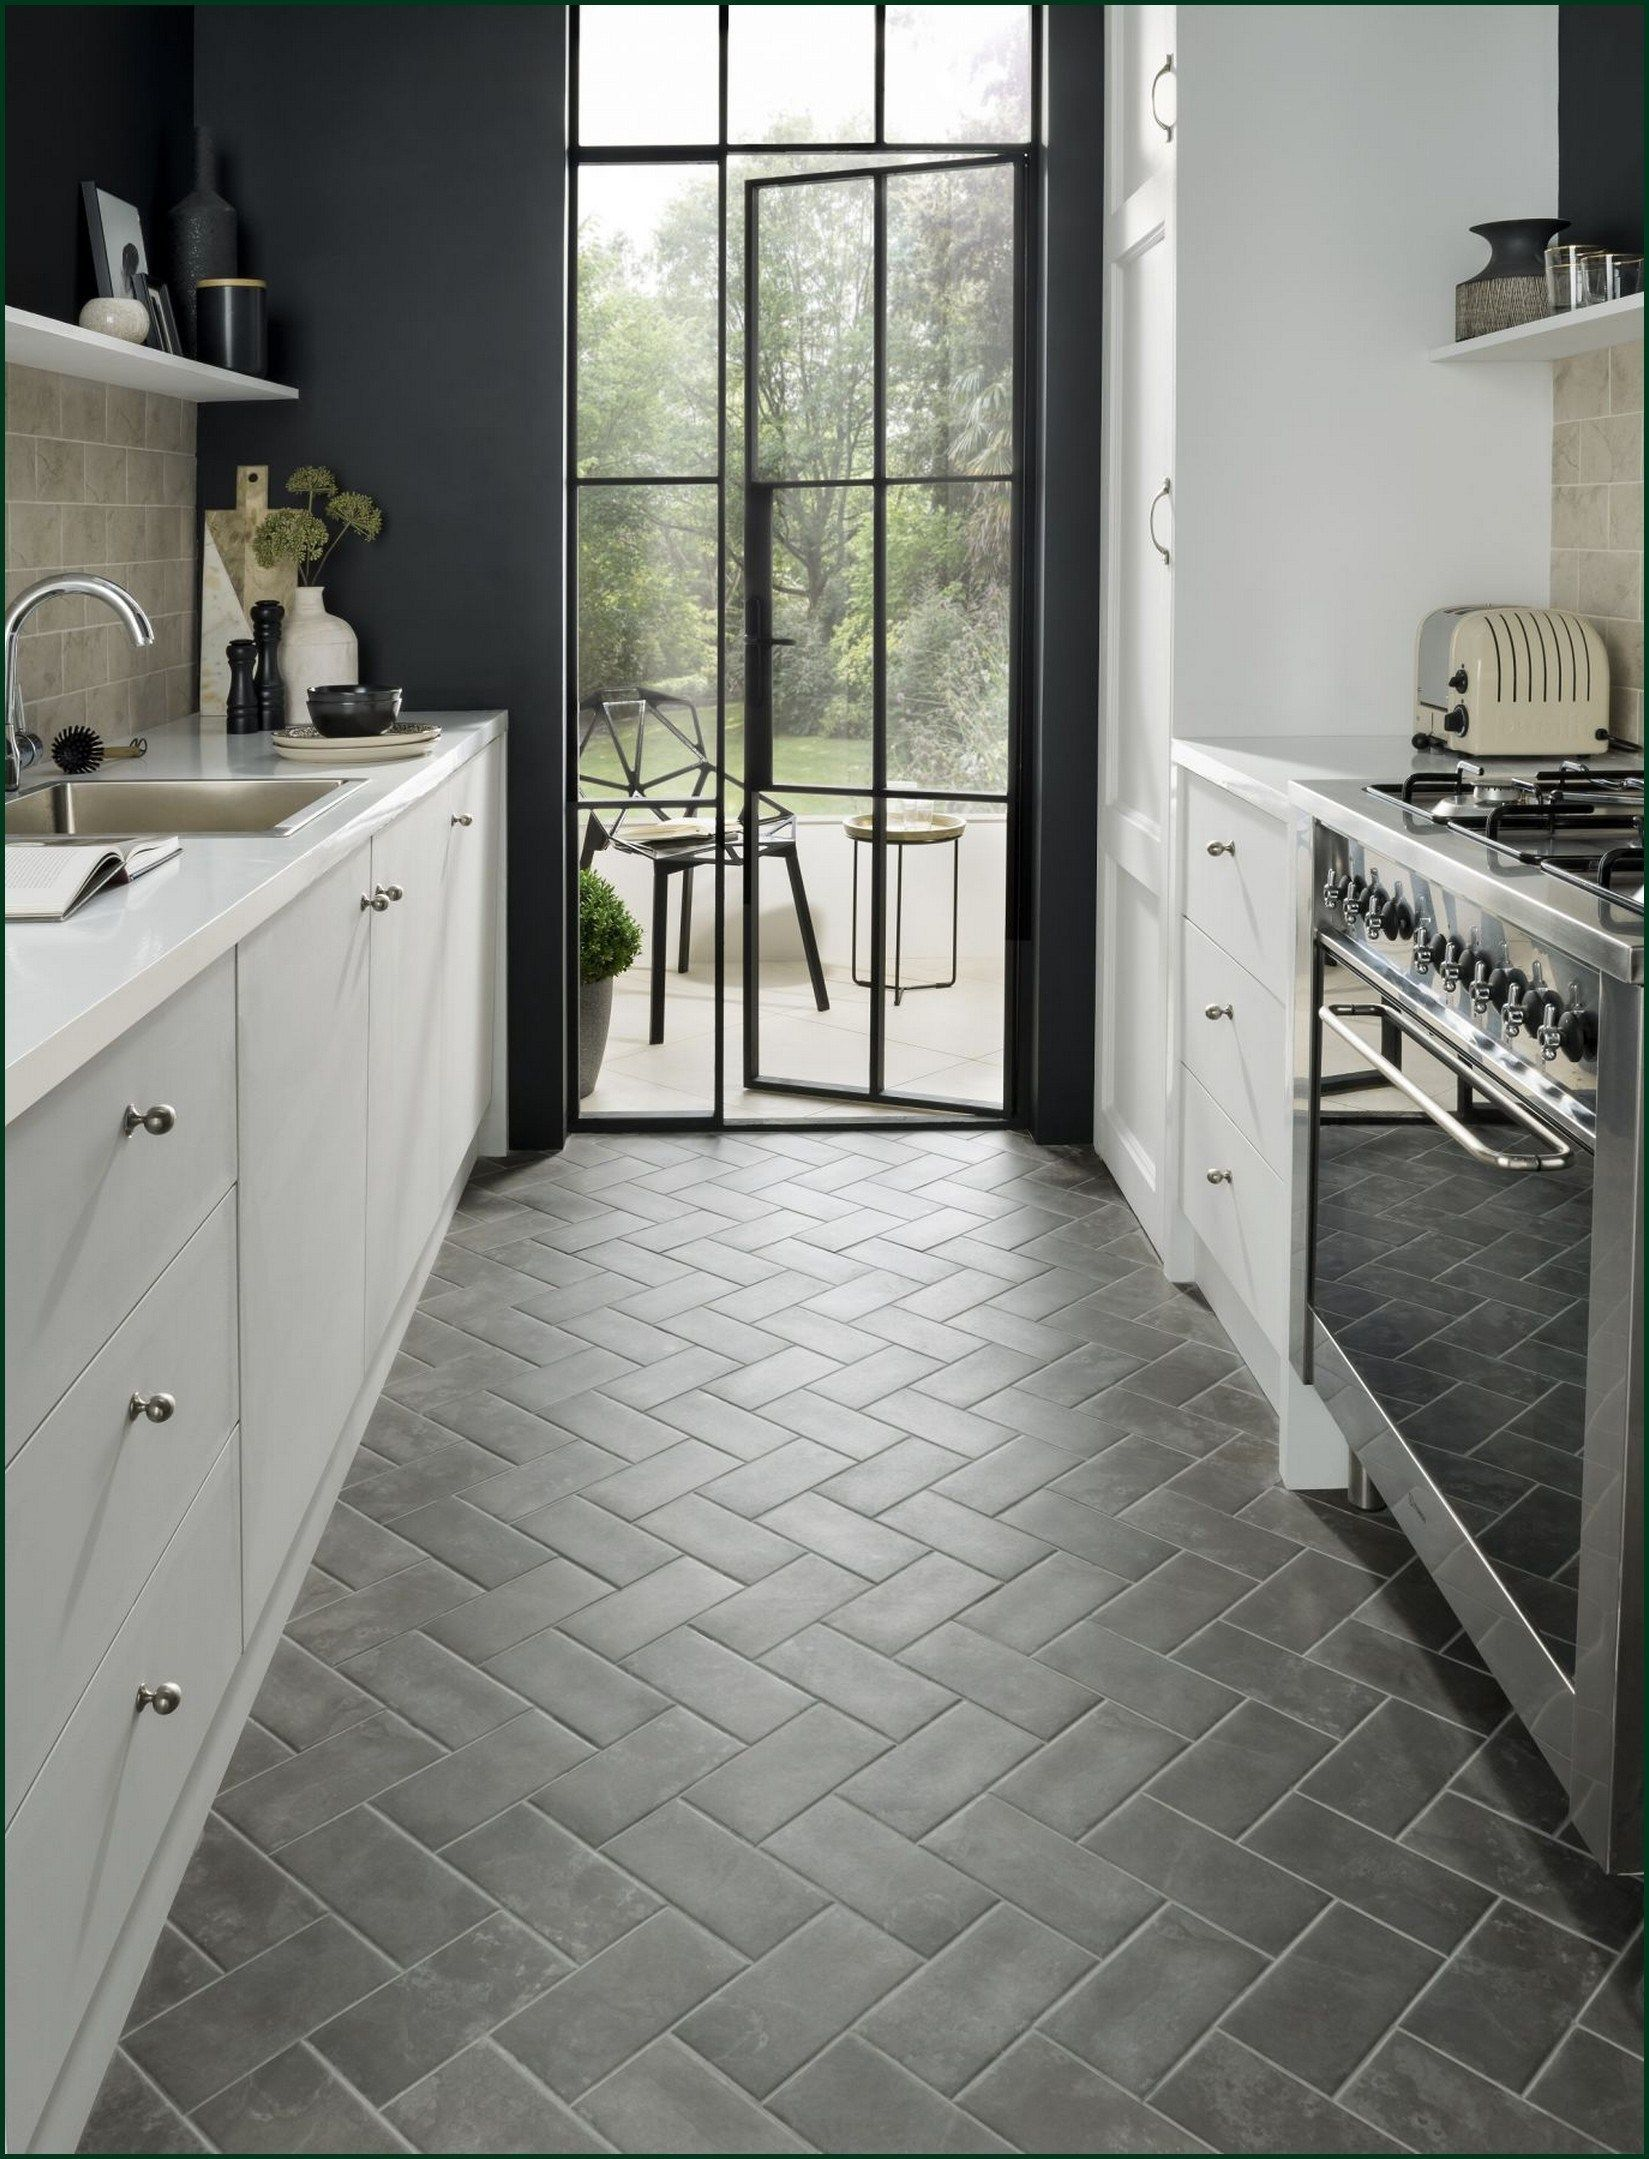 Kitchen Floor Tile Retro Commercial Marble Kitchen Floor Tile In 2020 Kitchen Flooring Kitchen Remodeling Projects Kitchen Floor Tile